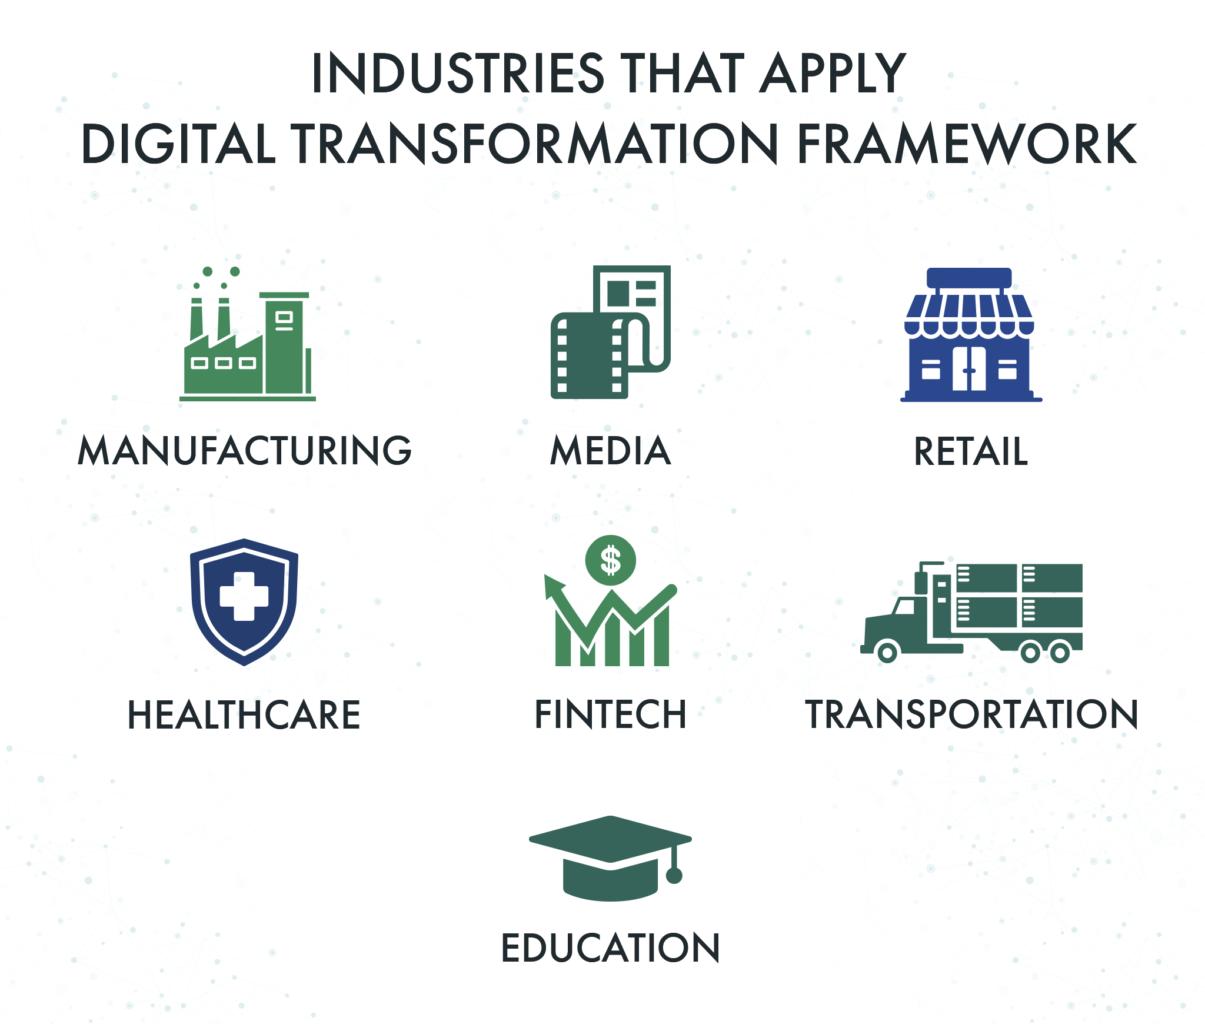 industries that apply a digital transforation framework